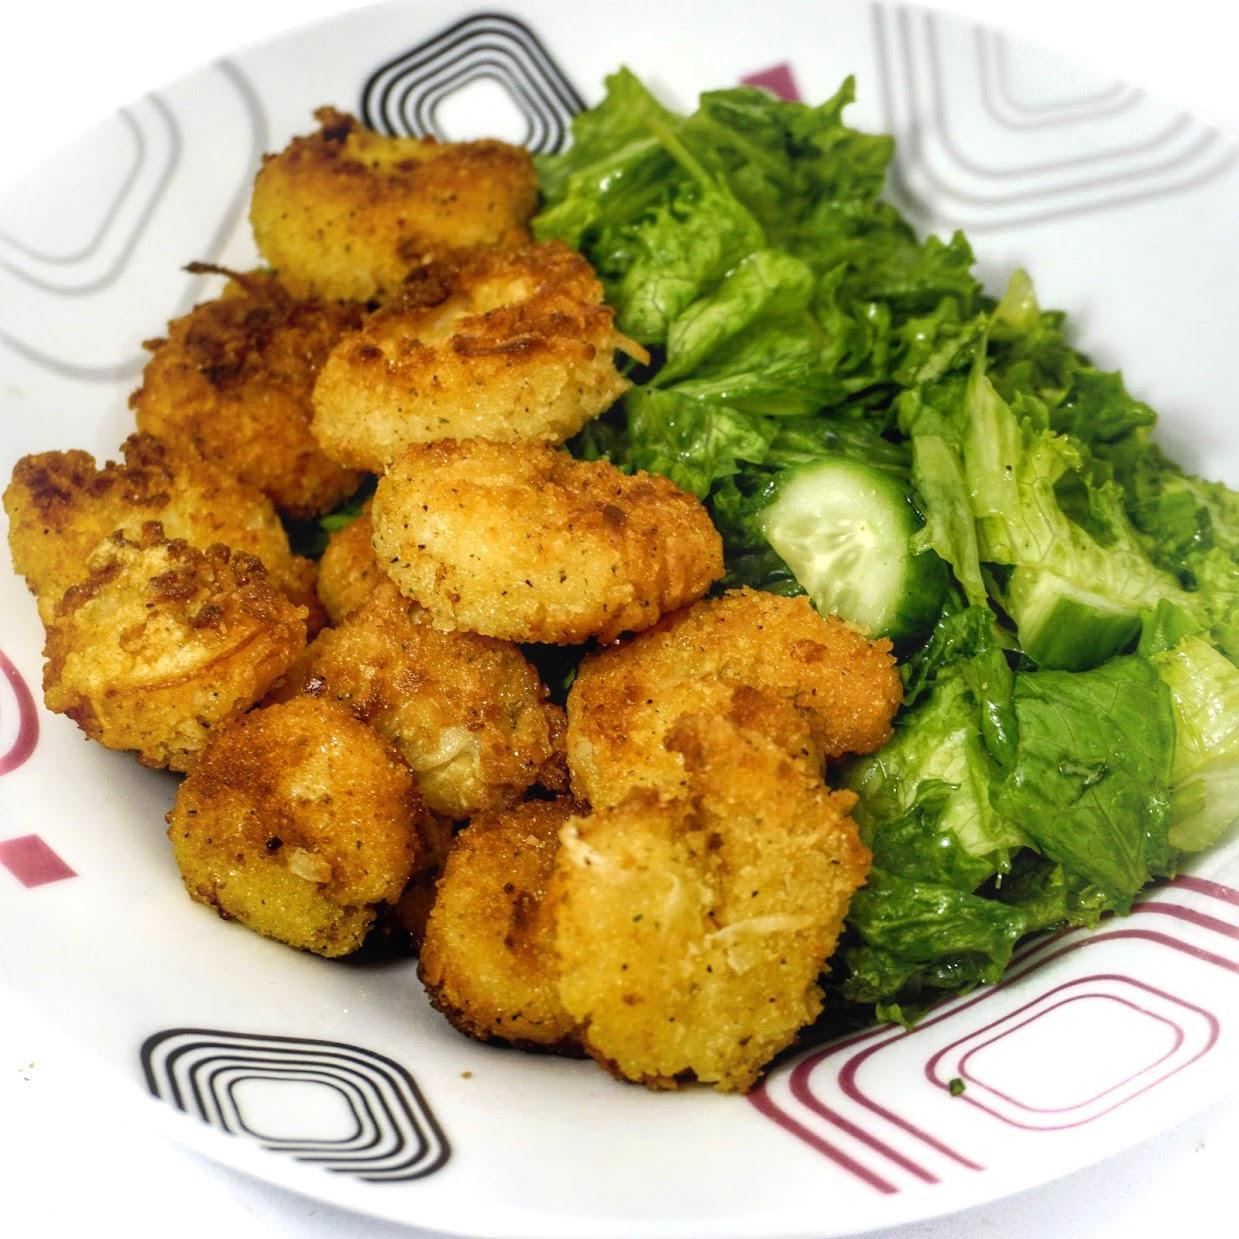 Easy Coconut Shrimp Recipe with Chili-Garlic Mayo & Salad